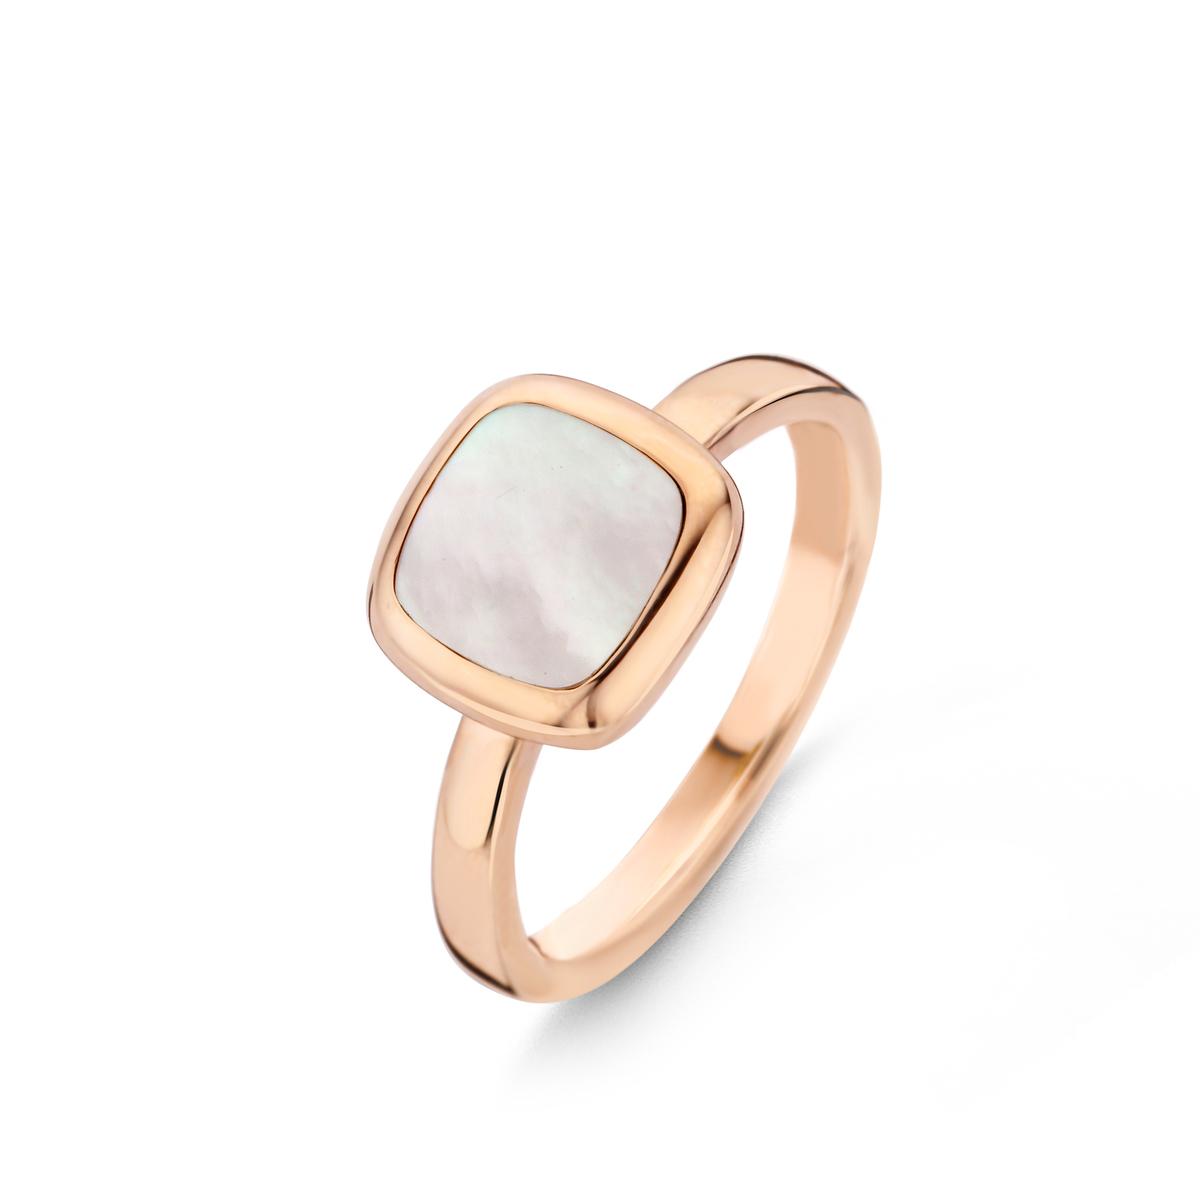 pantelleria ring in rose gold